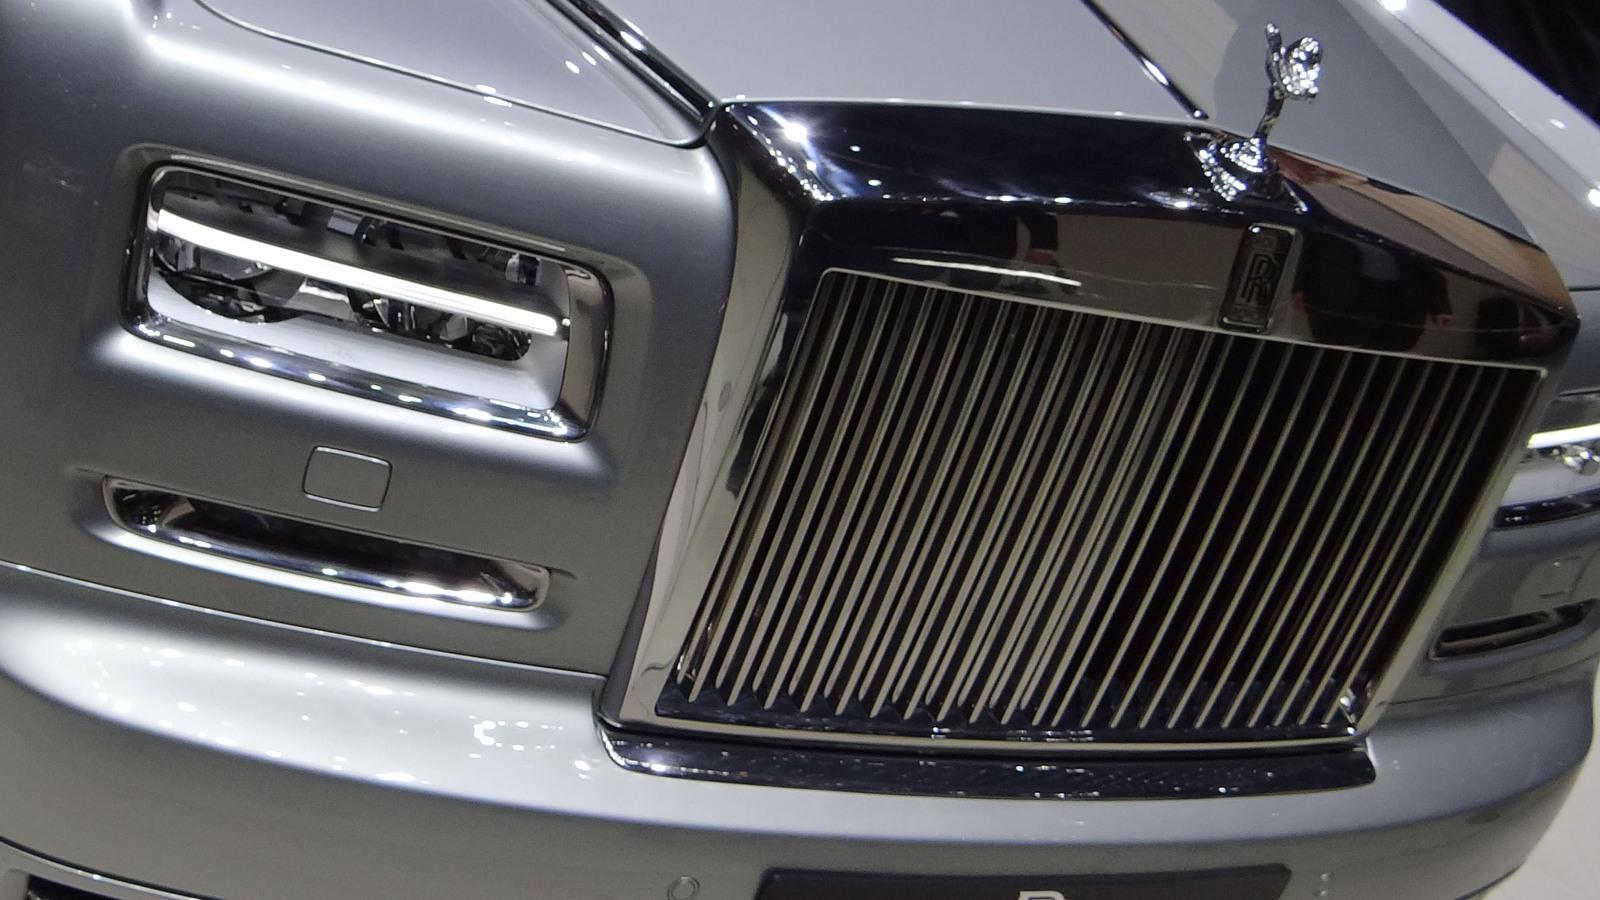 Rolls-Royce Phantom Series II live photos